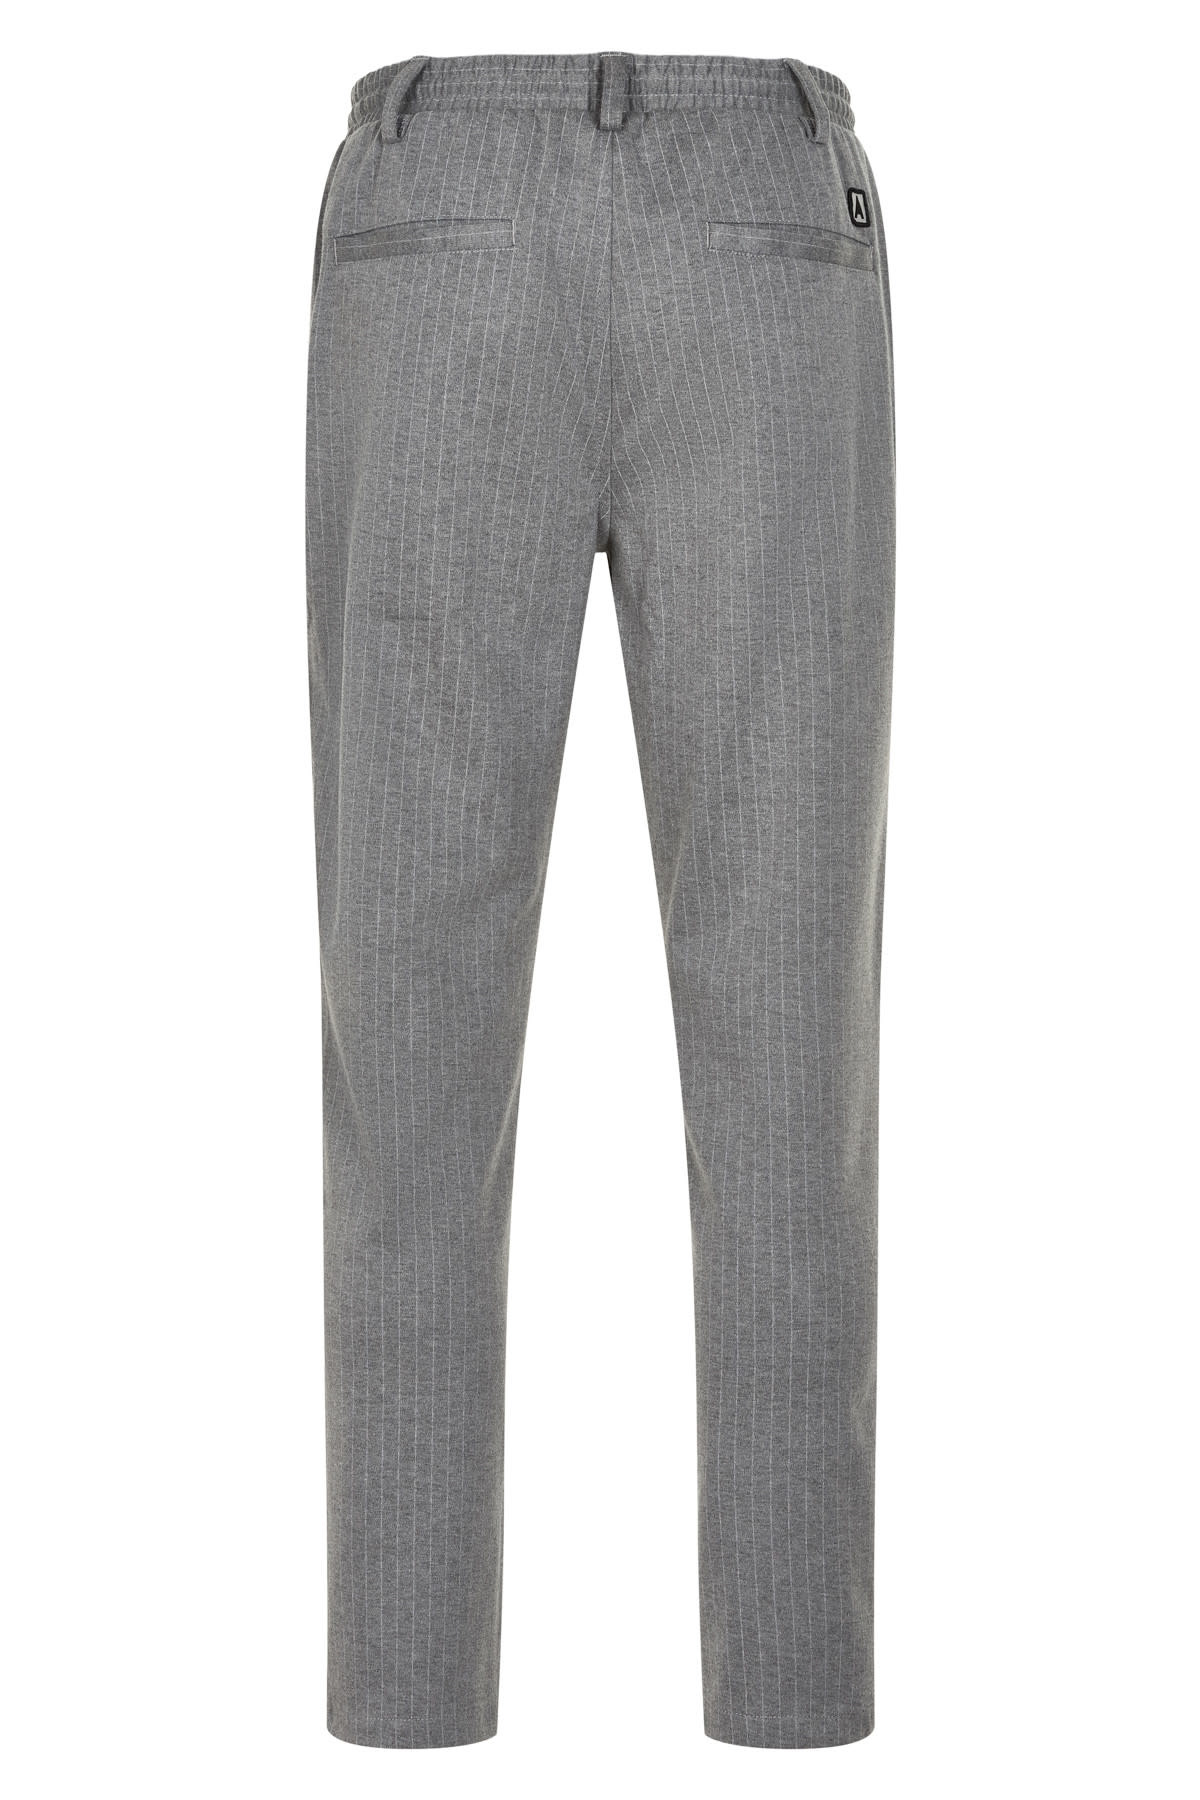 Anerkjendt Anerkjendt Akbuddy Stripe Pant Caviar Stell Grey